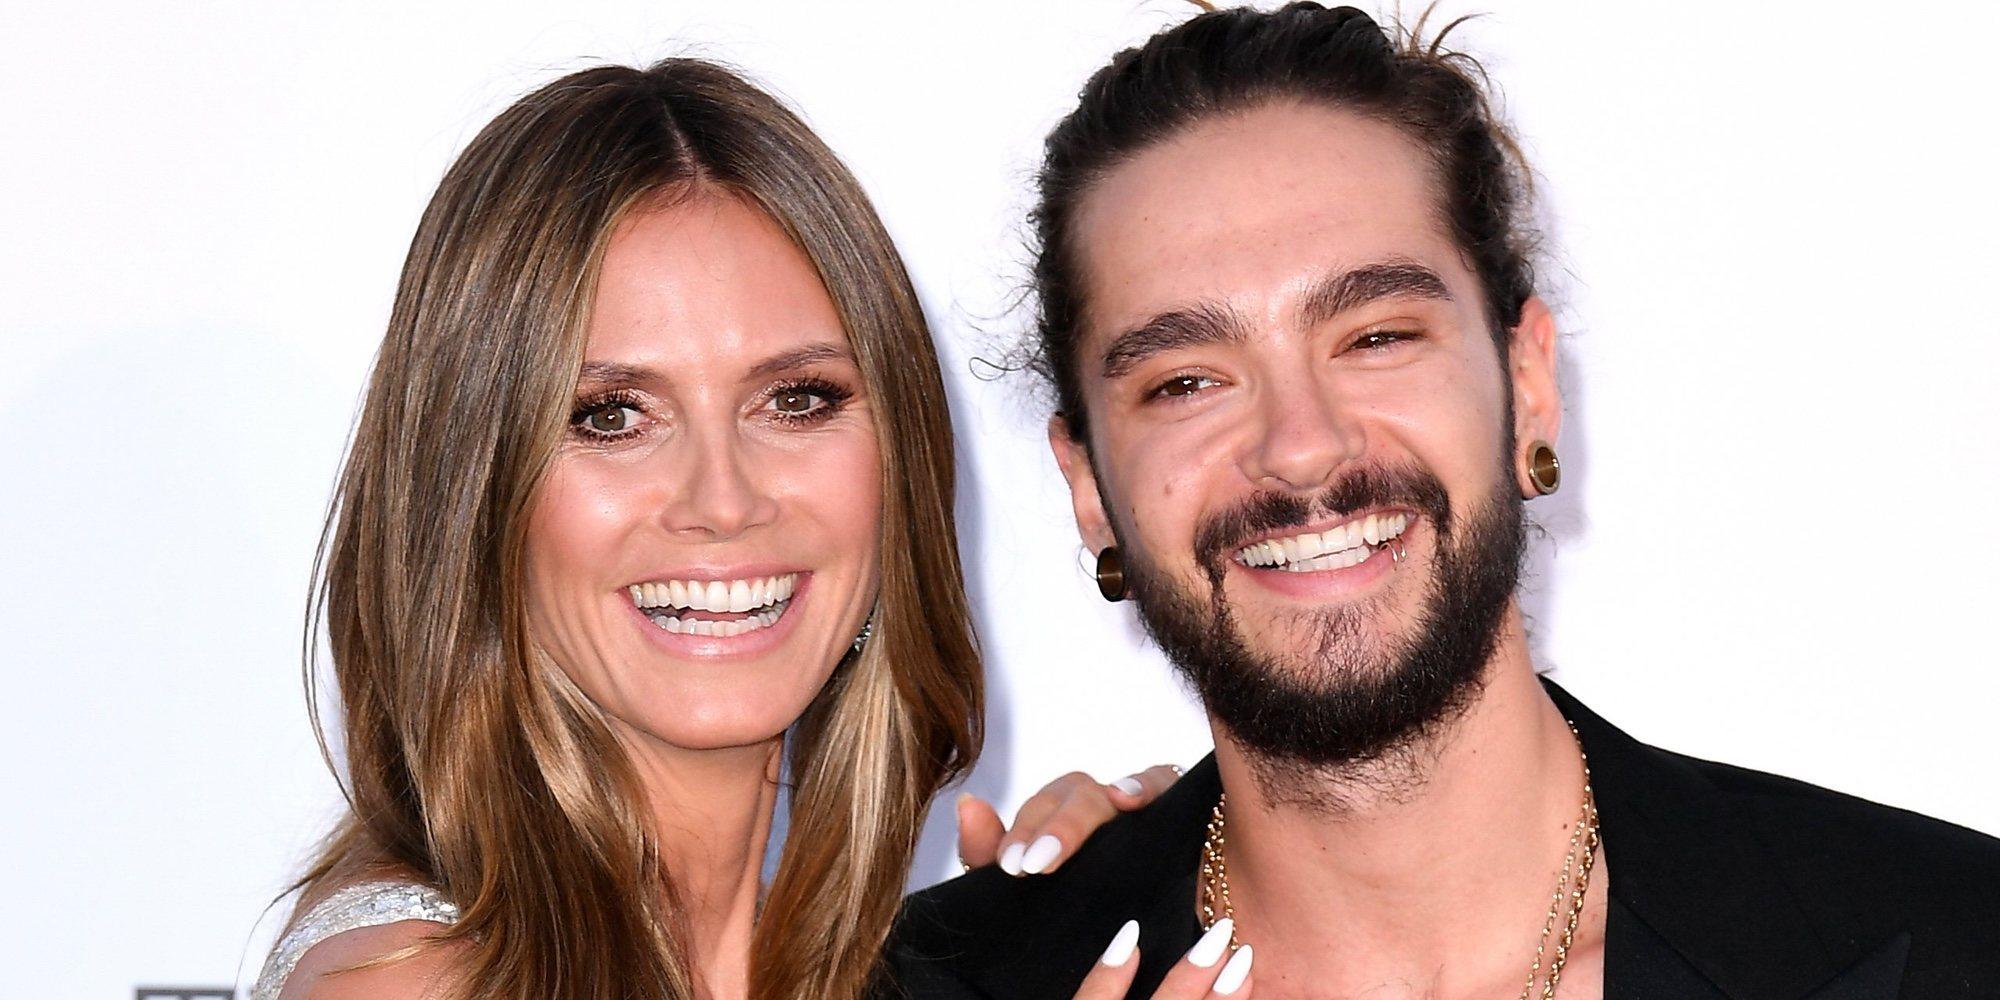 Heidi Klum y Tom Kaulitz se han comprometido